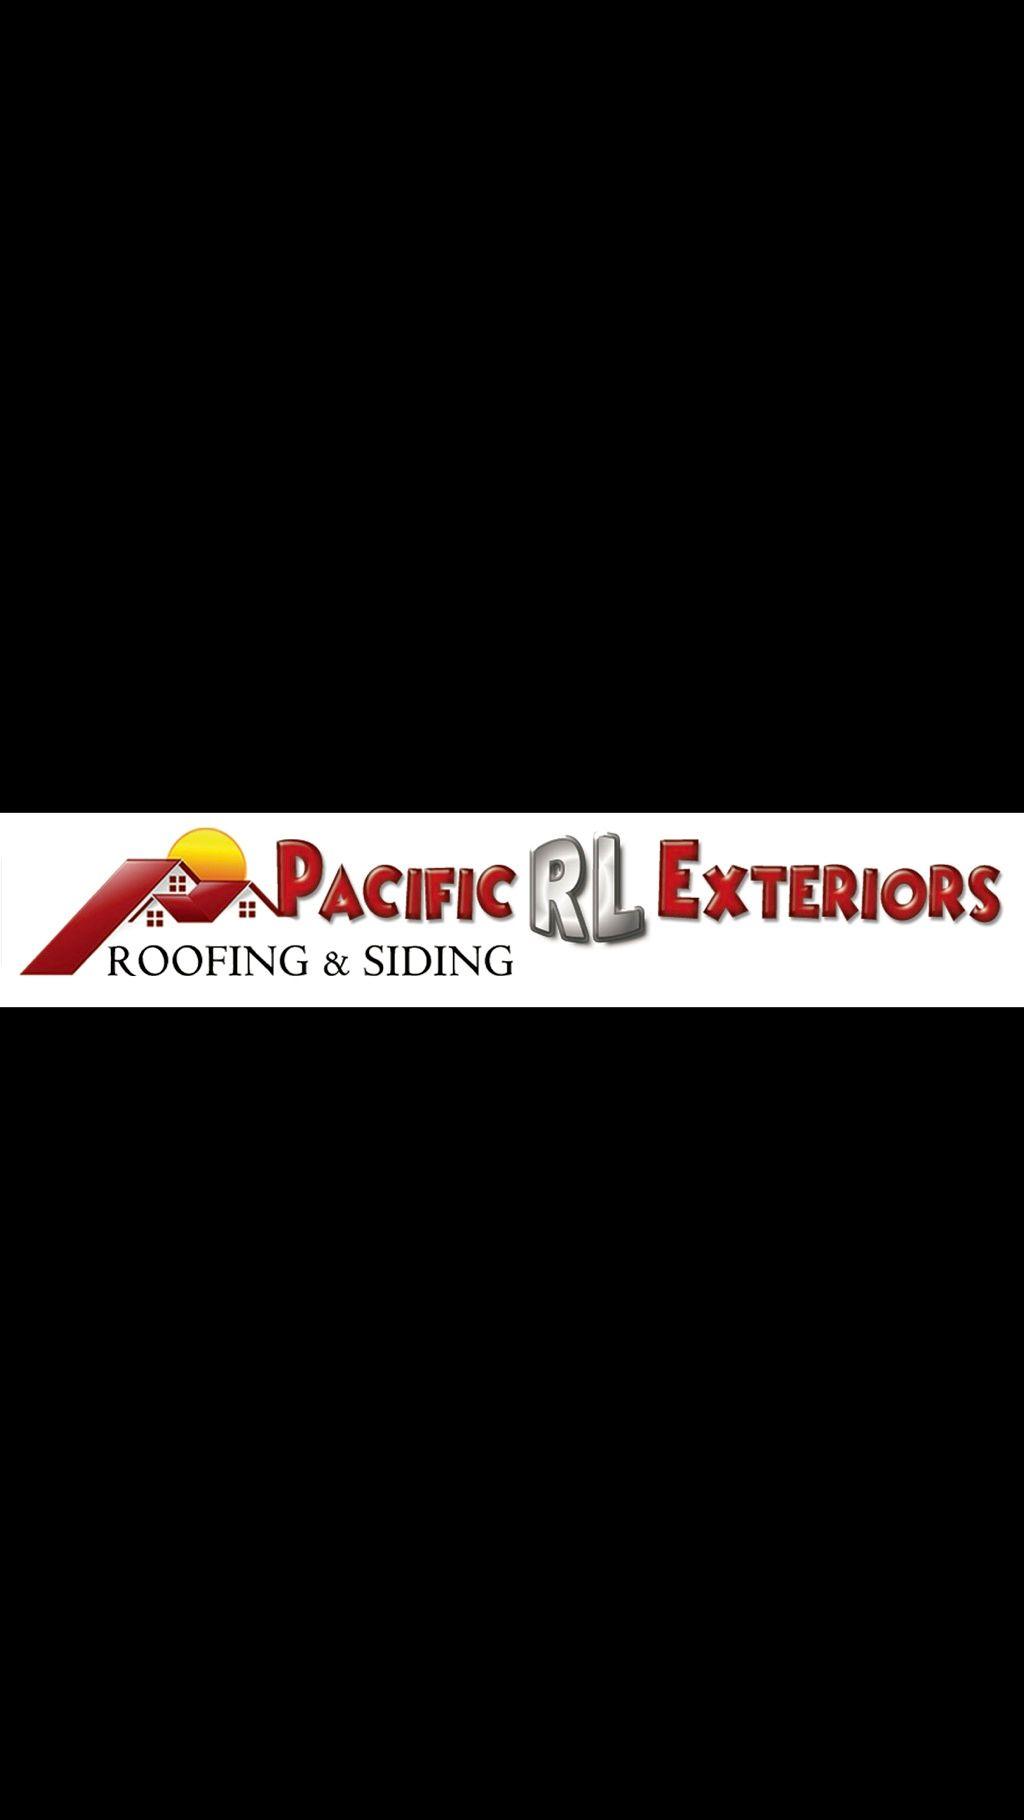 Pacific RL Exteriors